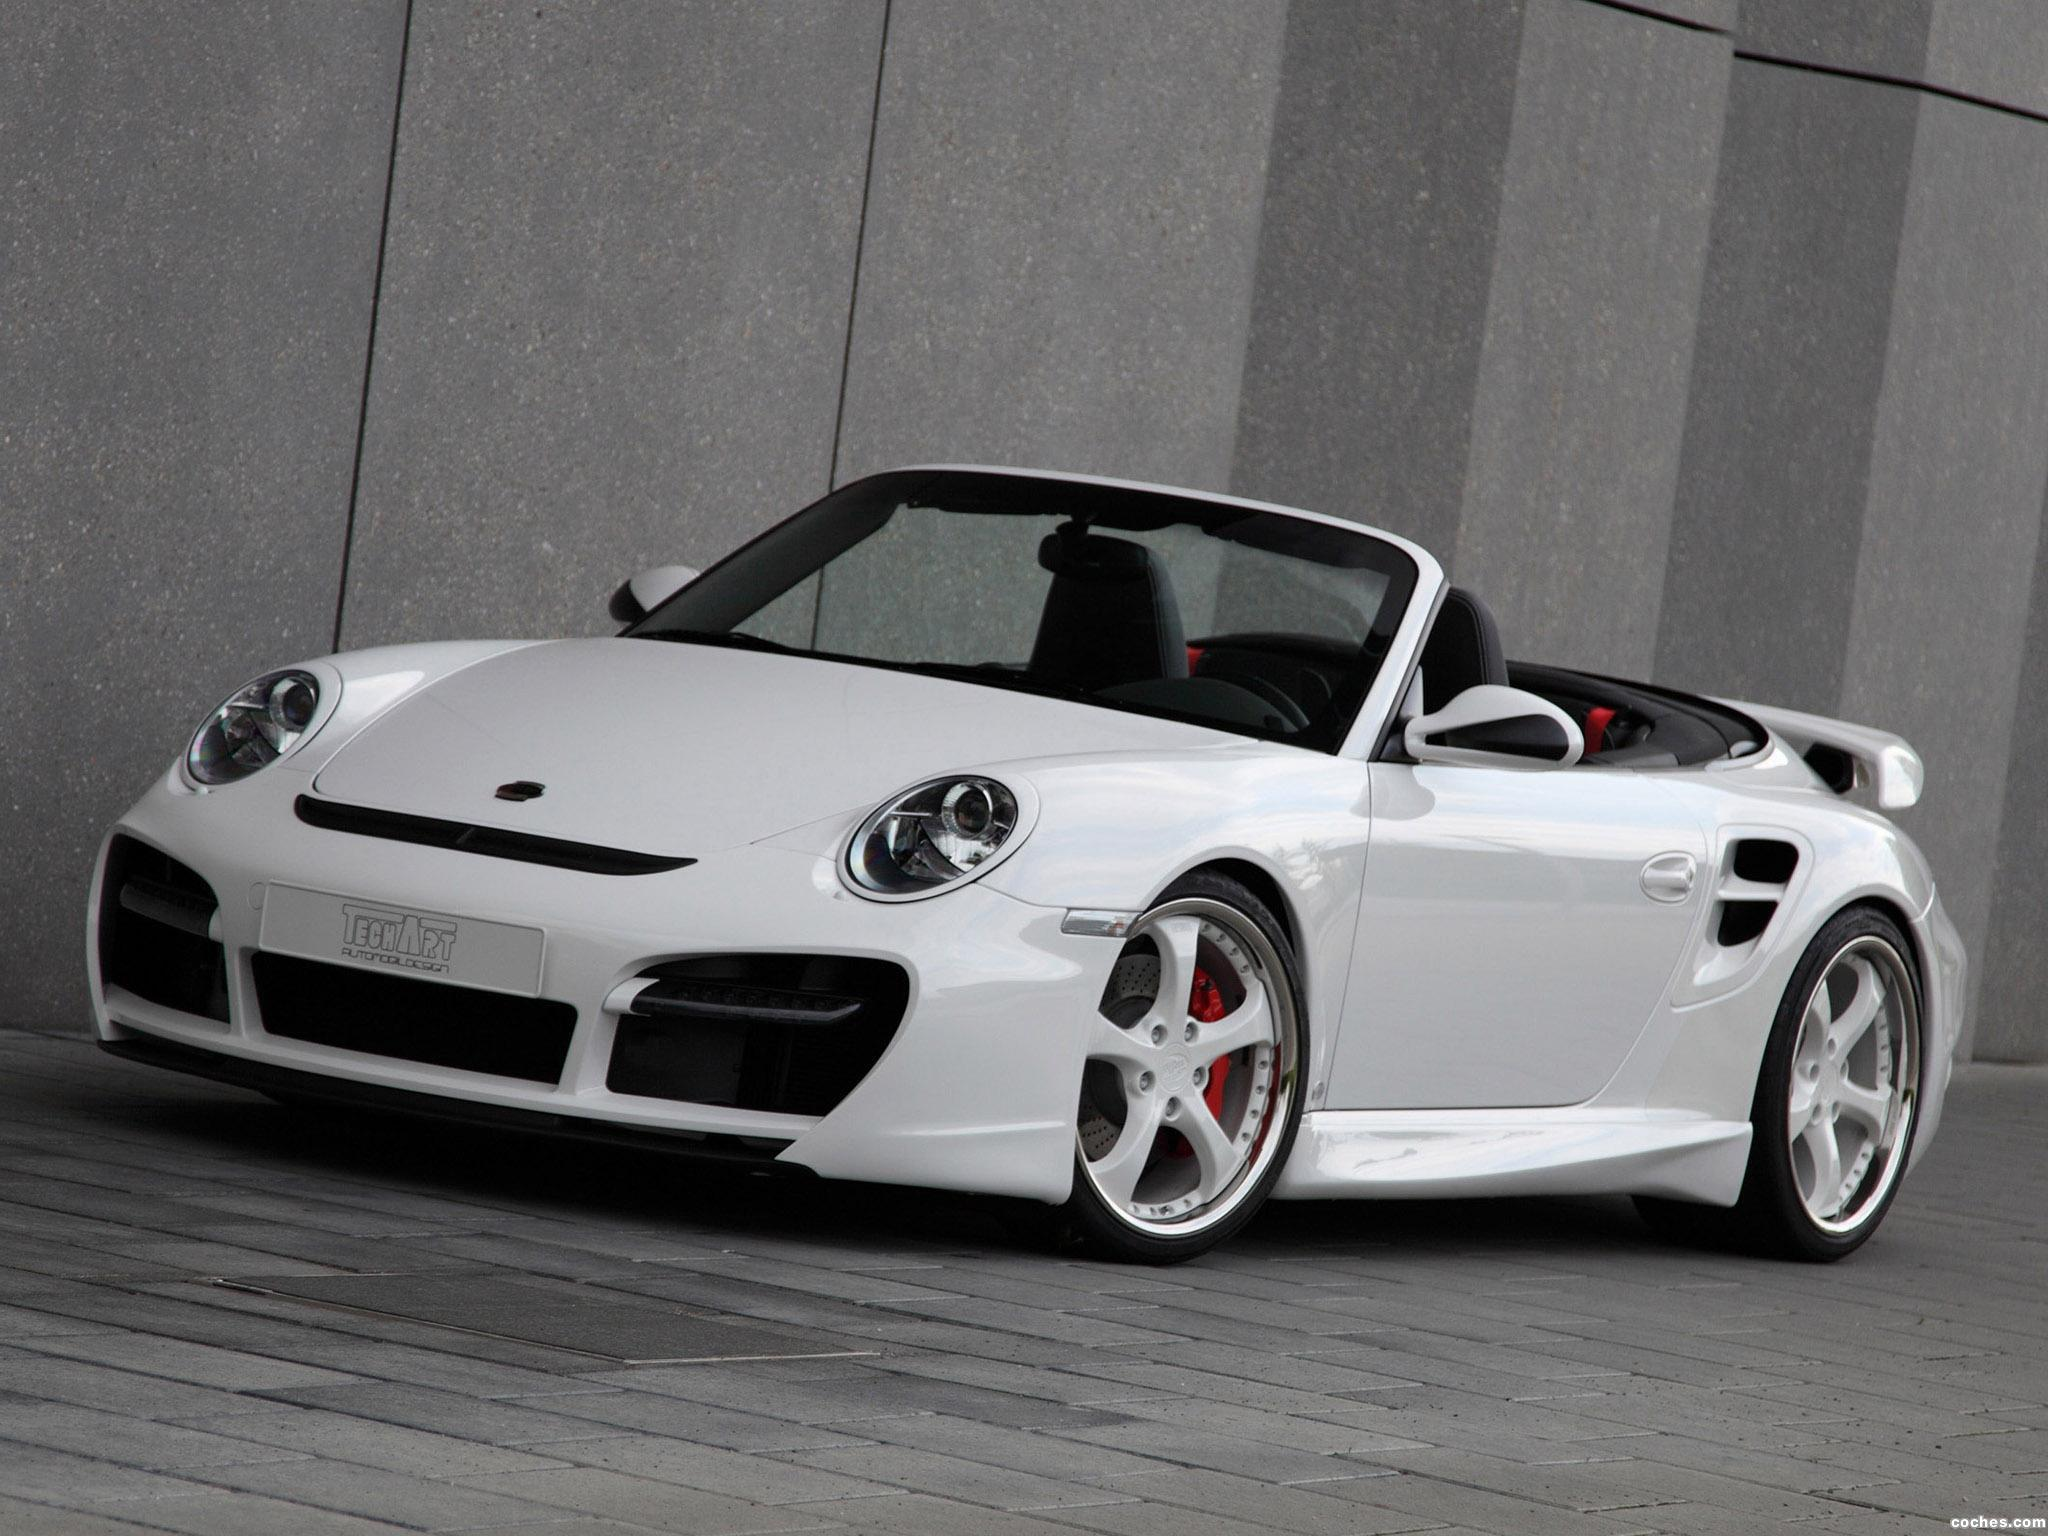 techart_porsche-911-cabrio-turbo-aerokit-ii-2010_r3.jpg